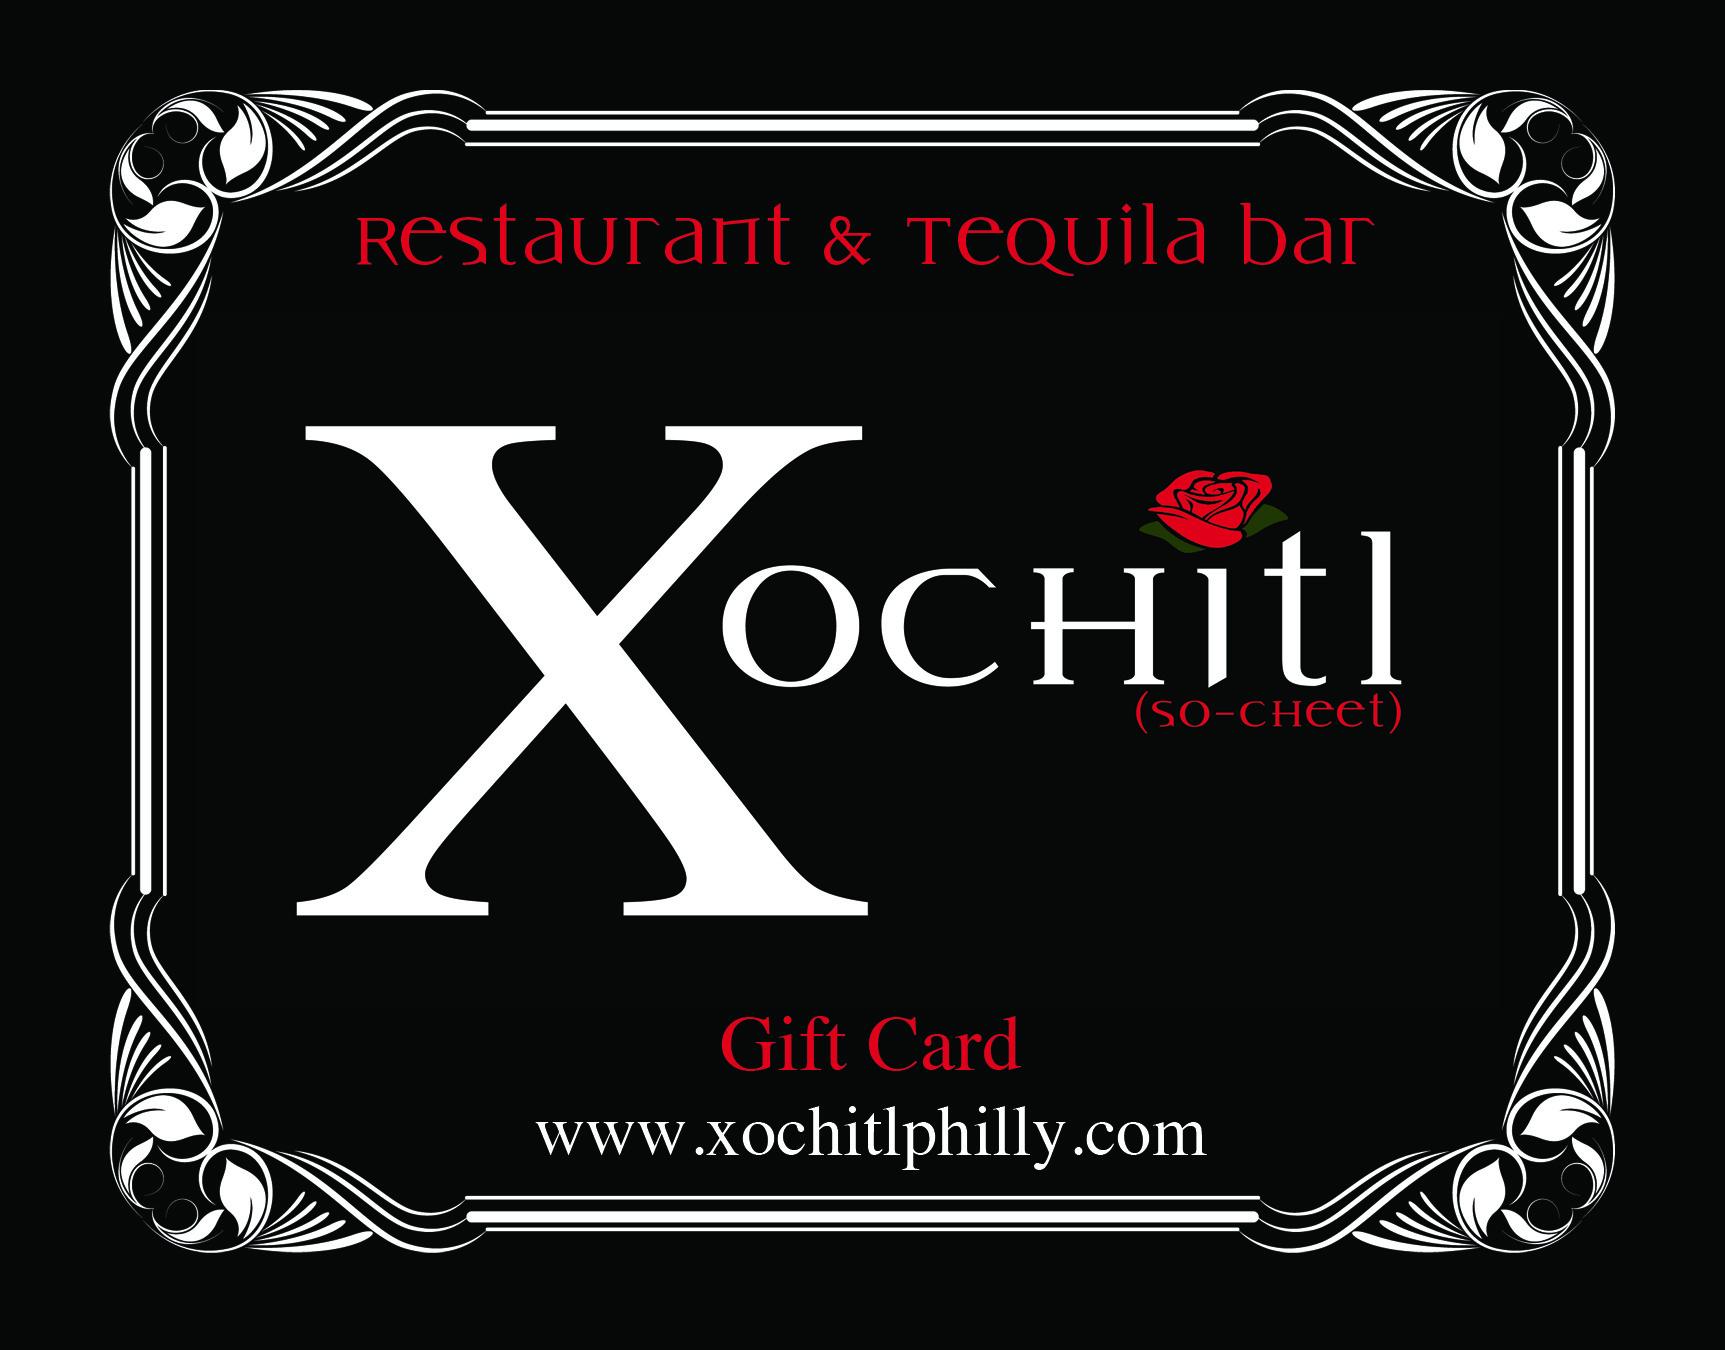 Xochit-Horizontal-Front.jpg